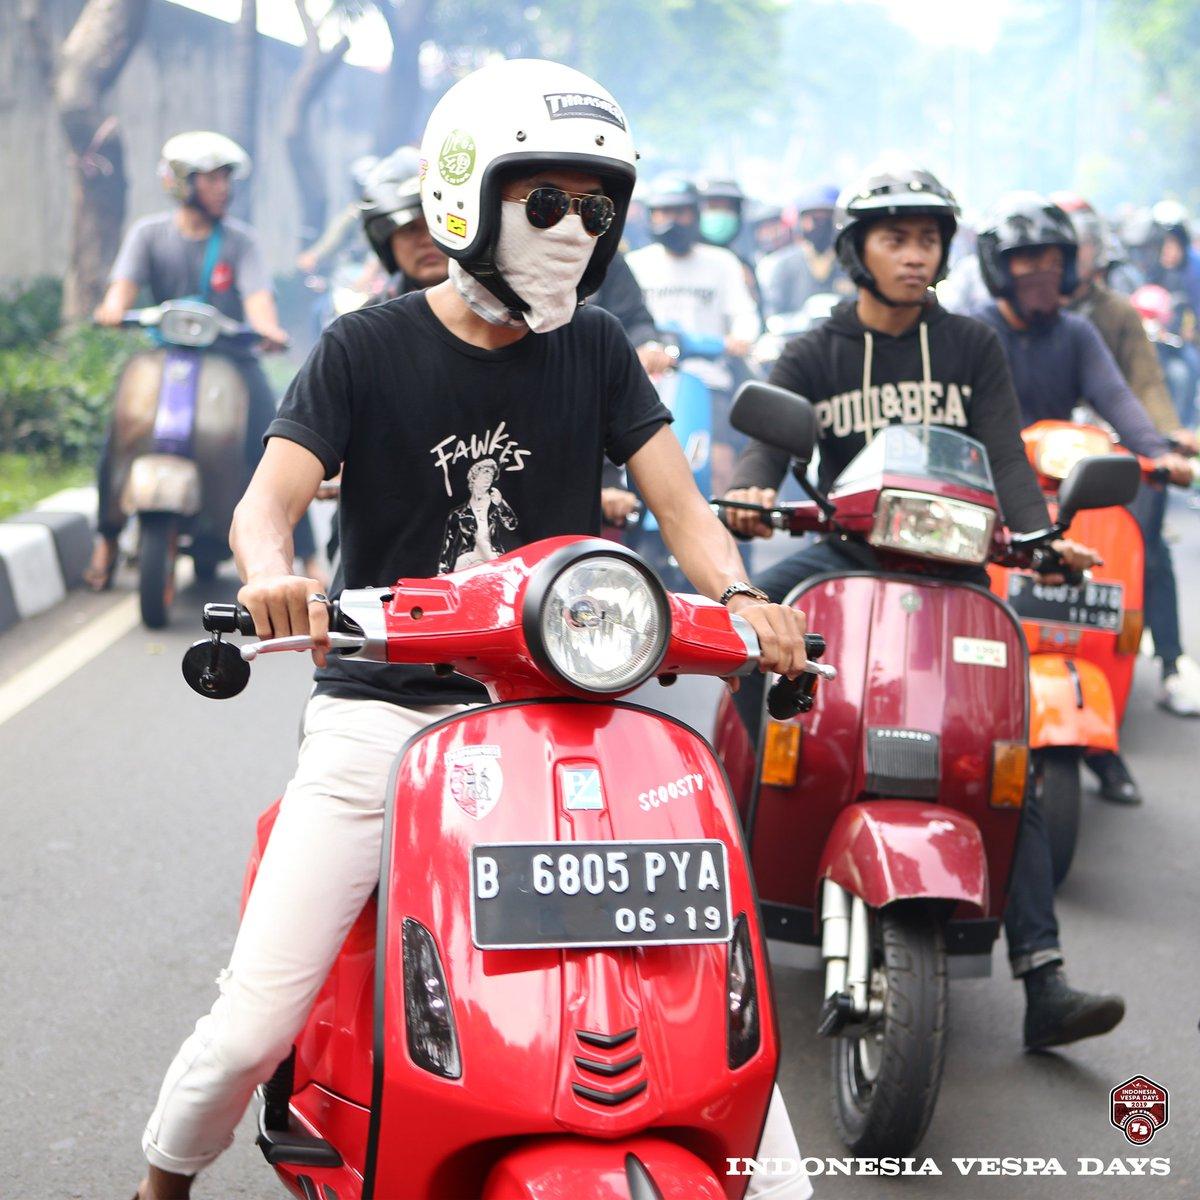 Tetep kalem bersama Vespa | 📷 by #IndonesiaVespaDays Team #vespa #piaggio #setaradivespa #vespa_official #vespaworld #indonesiavespadayscommunity #invadr #indonesiavespadays #vespaclub #vespacommunity #vespafamily #vespafreaks #vespagroup #vespagram #ivd2019